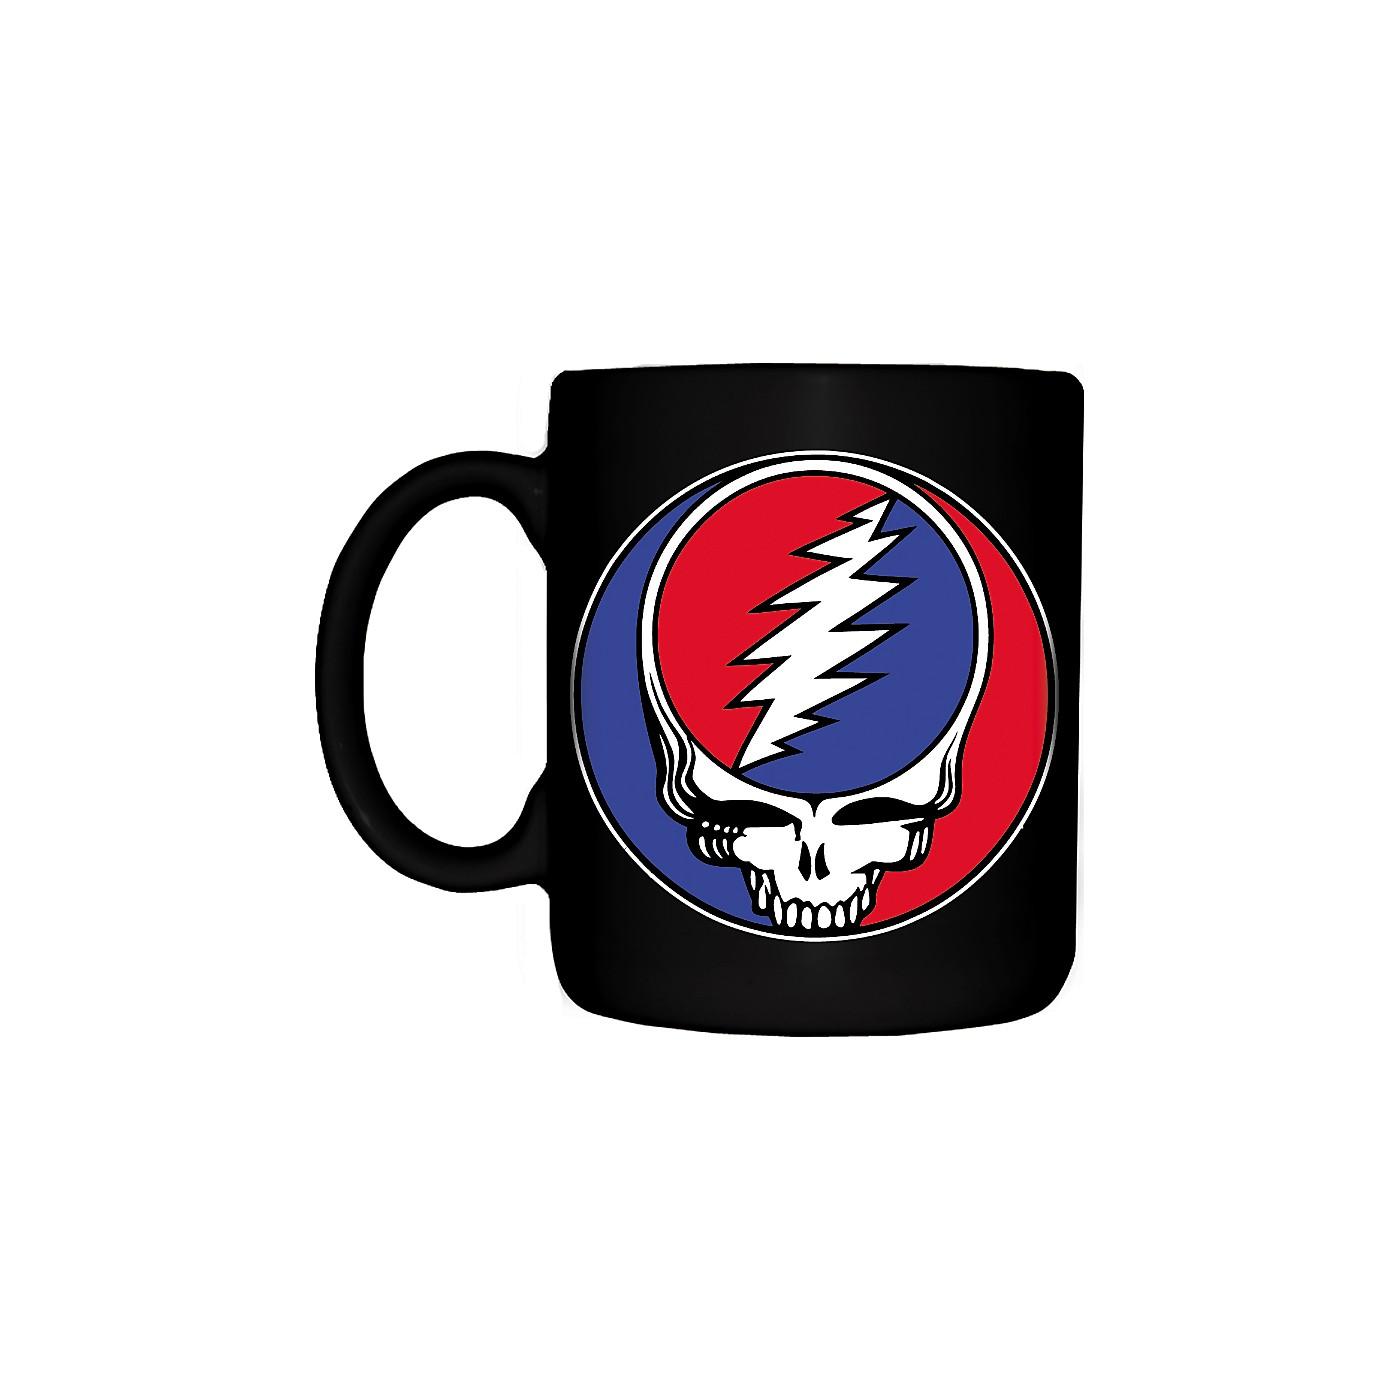 C&D Visionary Grateful Dead Mug - Steal Your Face thumbnail